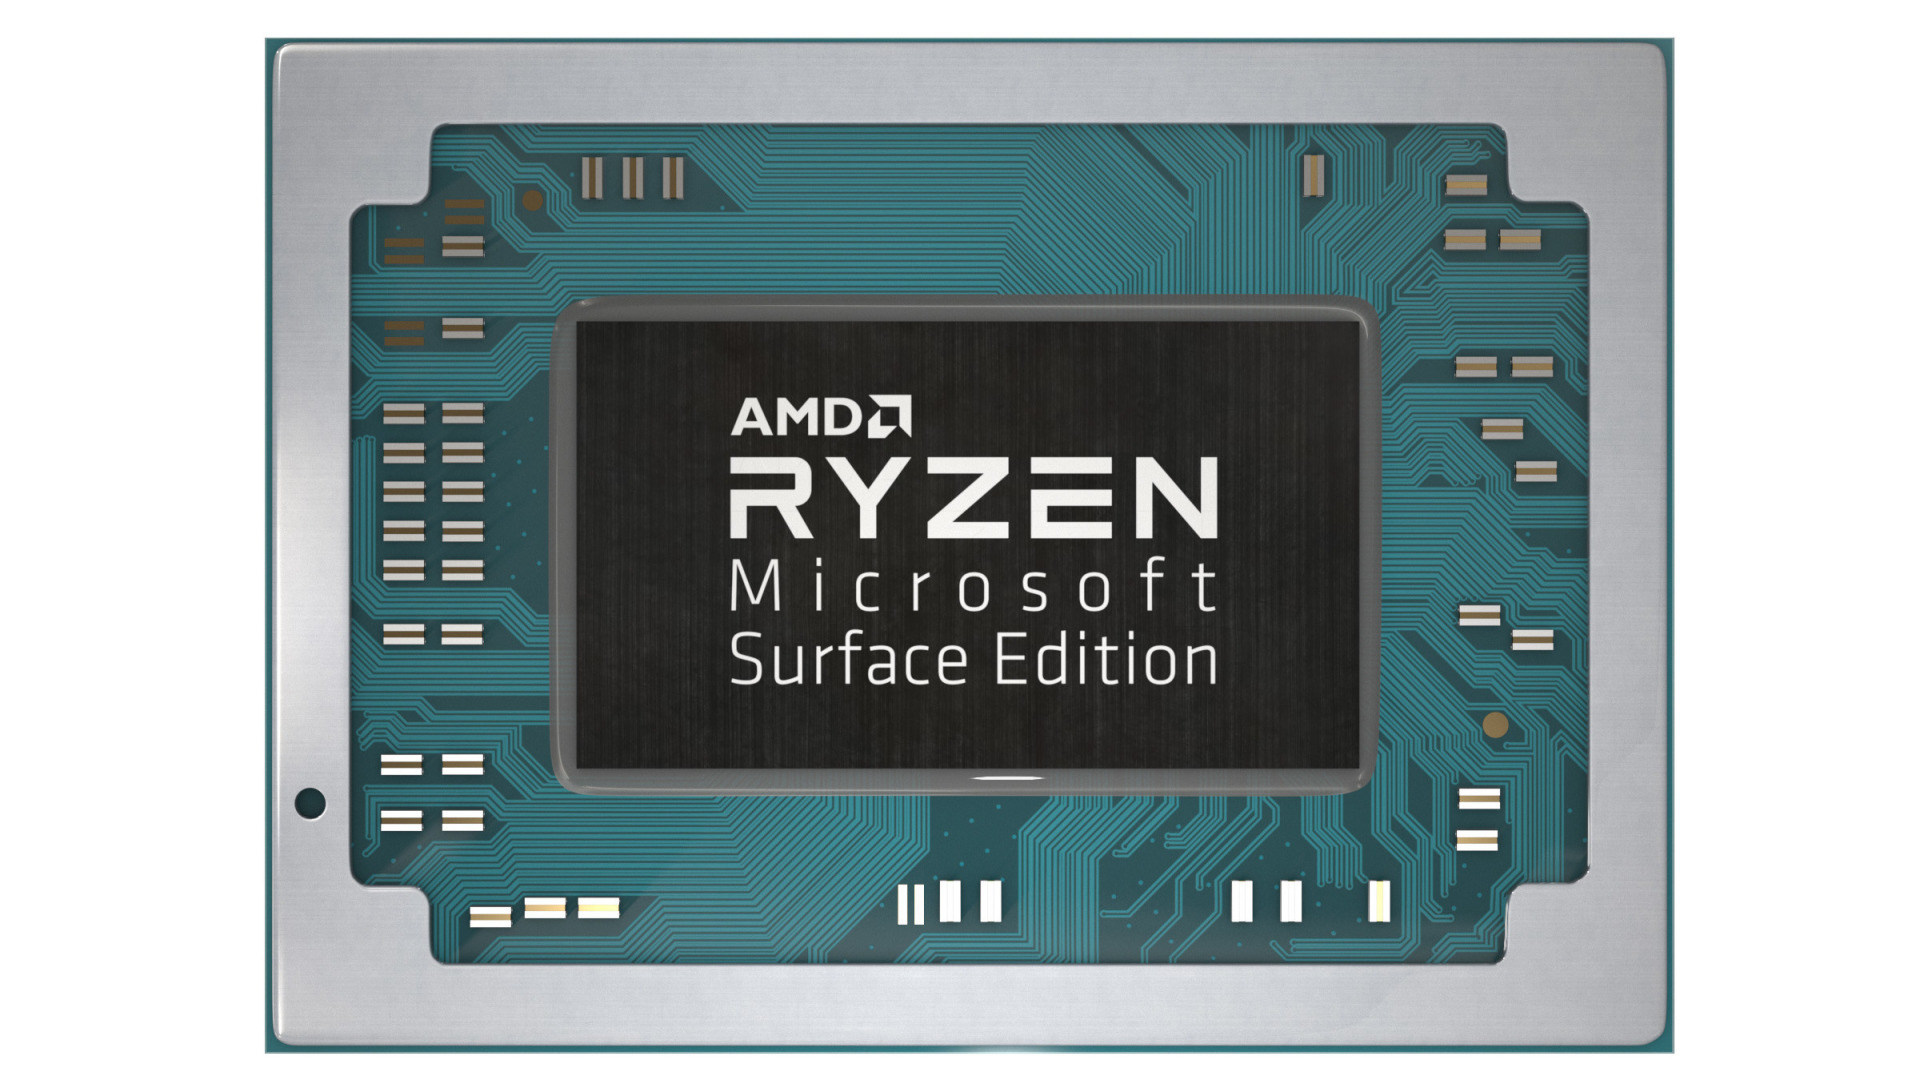 Microsoft, Prozessor, Cpu, Chip, Surface, Microsoft Surface, Amd, SoC, Ryzen, AMD Ryzen, Microsoft Surface Laptop 3, AMD Ryzen Microsoft Surface Edition